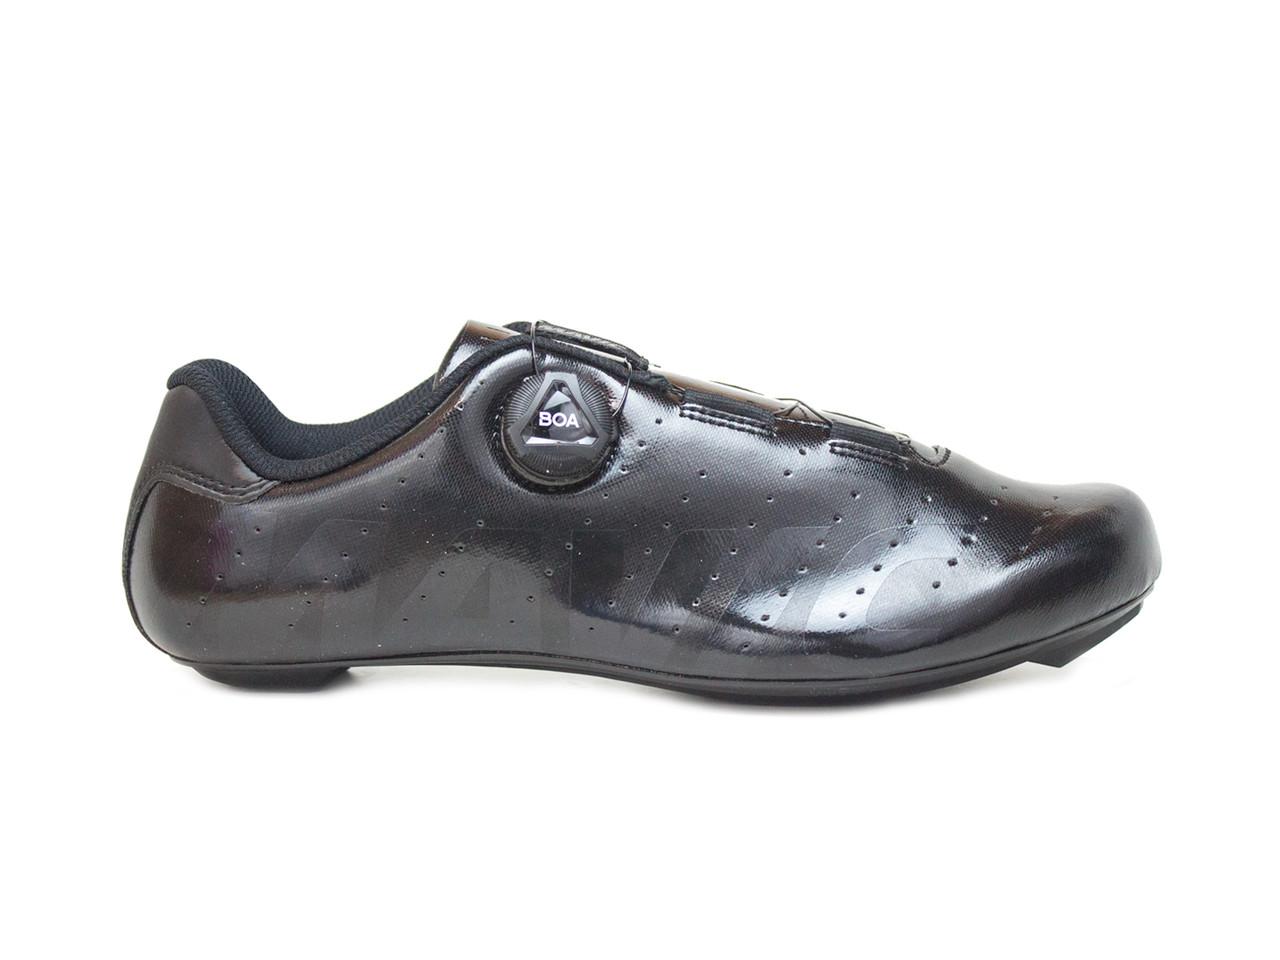 MAVIC Cosmic Boa BLACK L410120 Footwear Men's Shoes Road Performance